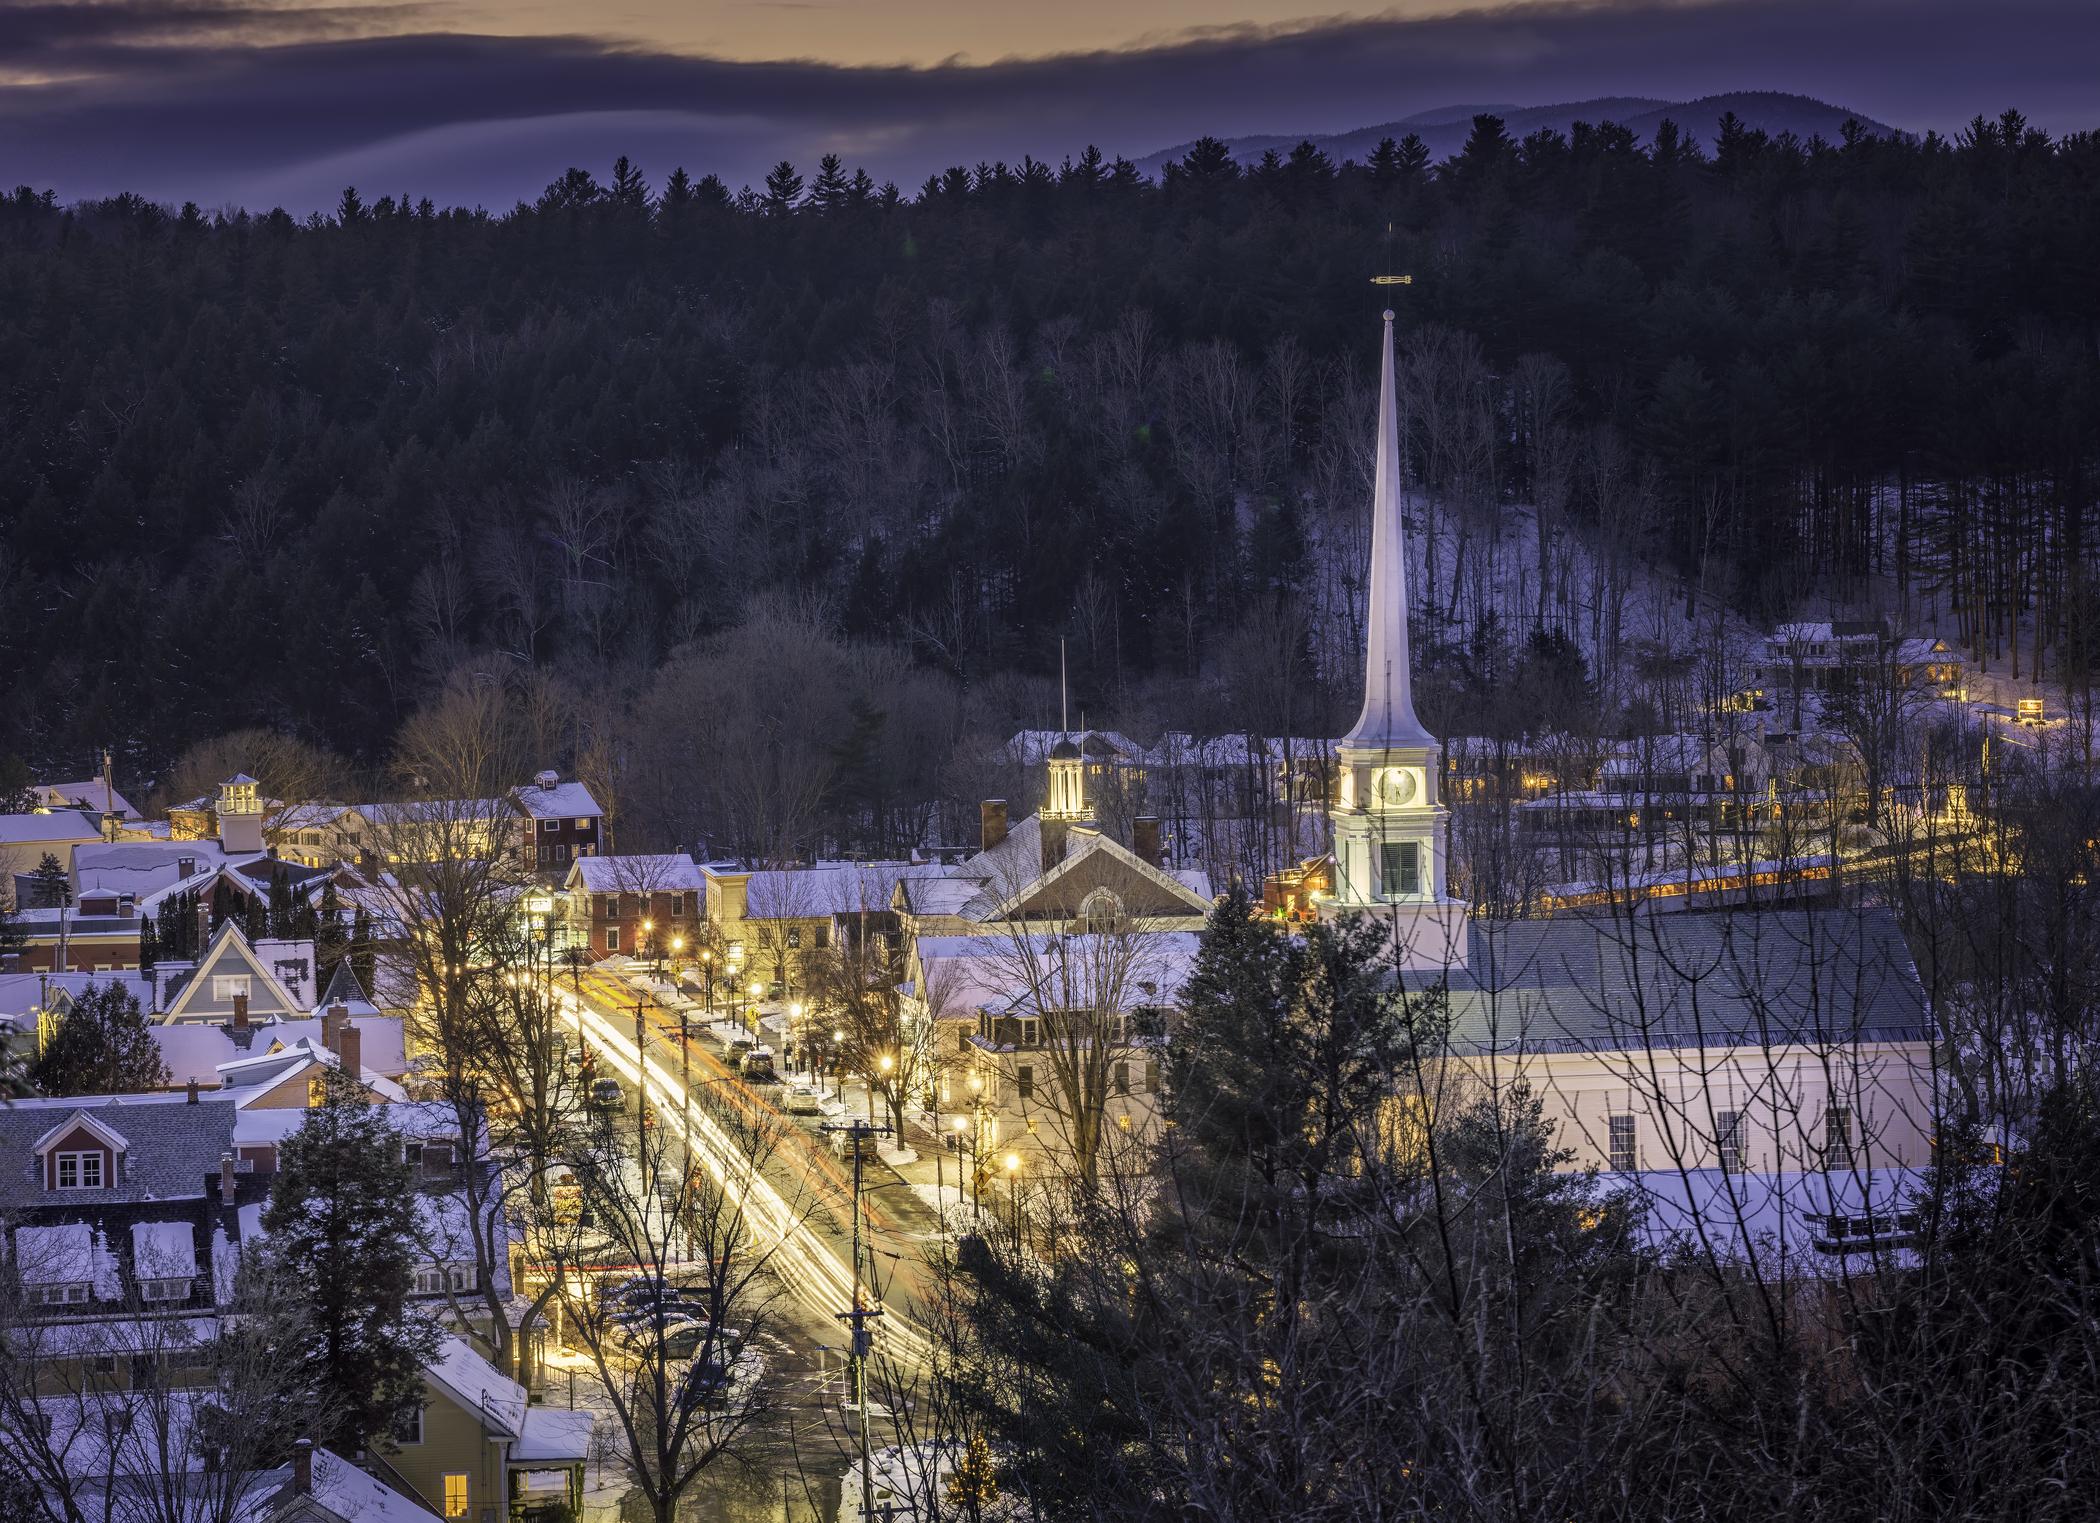 Stowe_Winter_Village_Church_Glowing_MarkVandenberg_DSC7357-Edit-2100x1523-d9bff4ed-ca34-492a-a331-ce72dab27d23